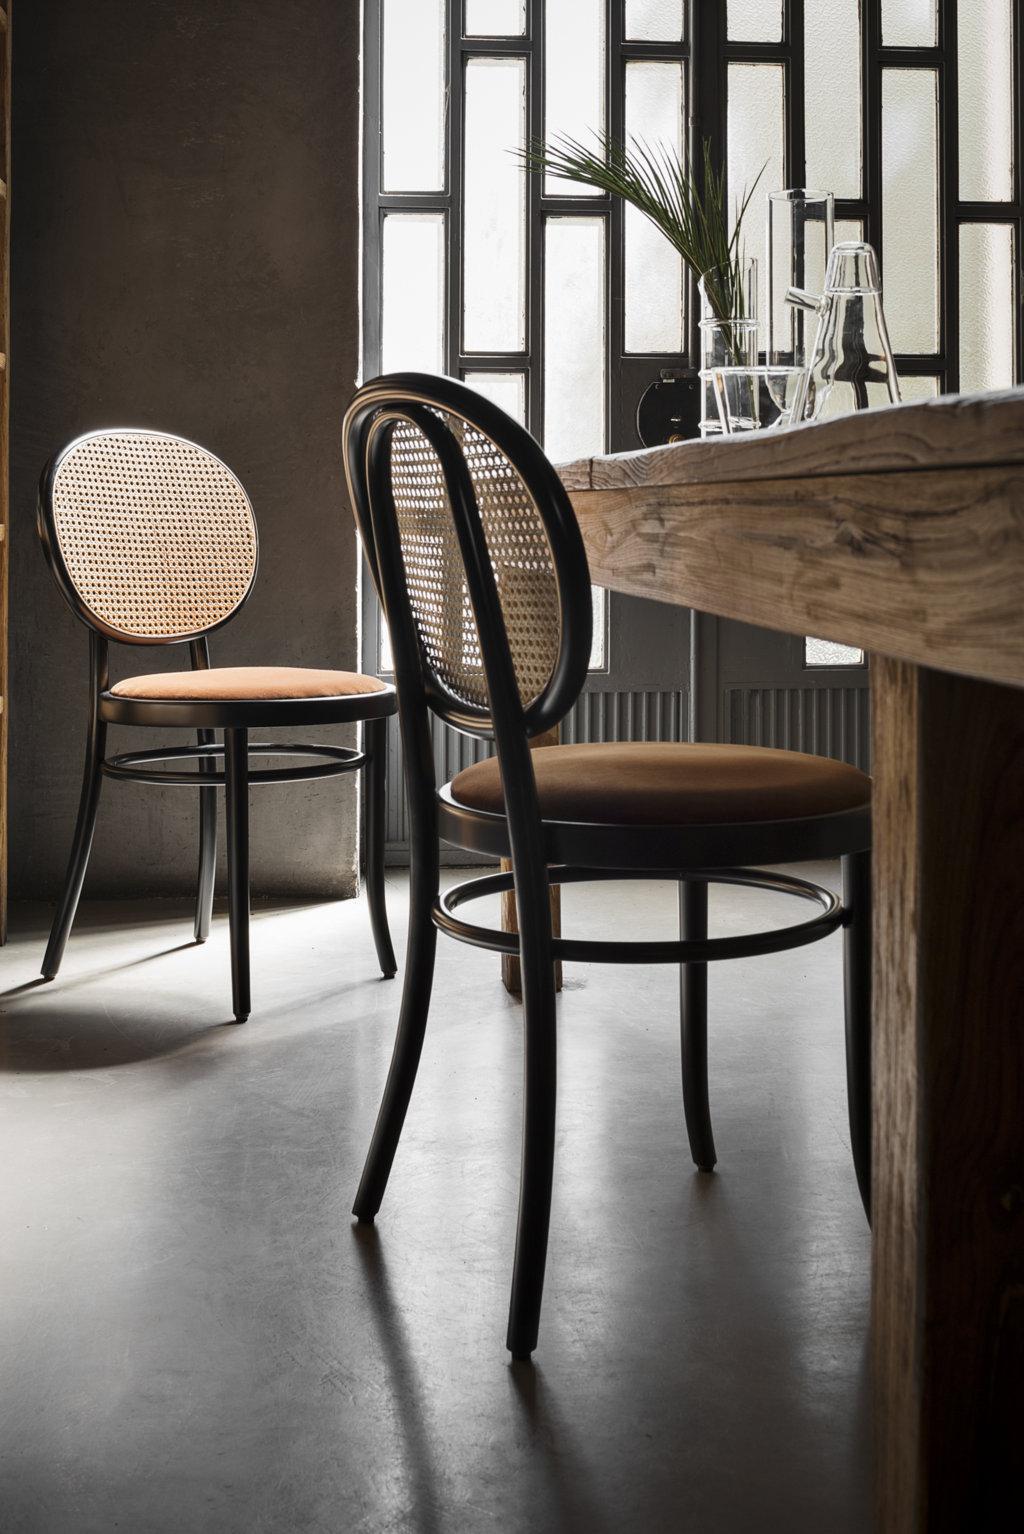 GTV_Chair-nr.-0_-design-by-Front-2017-5-FILEminimizer.jpg